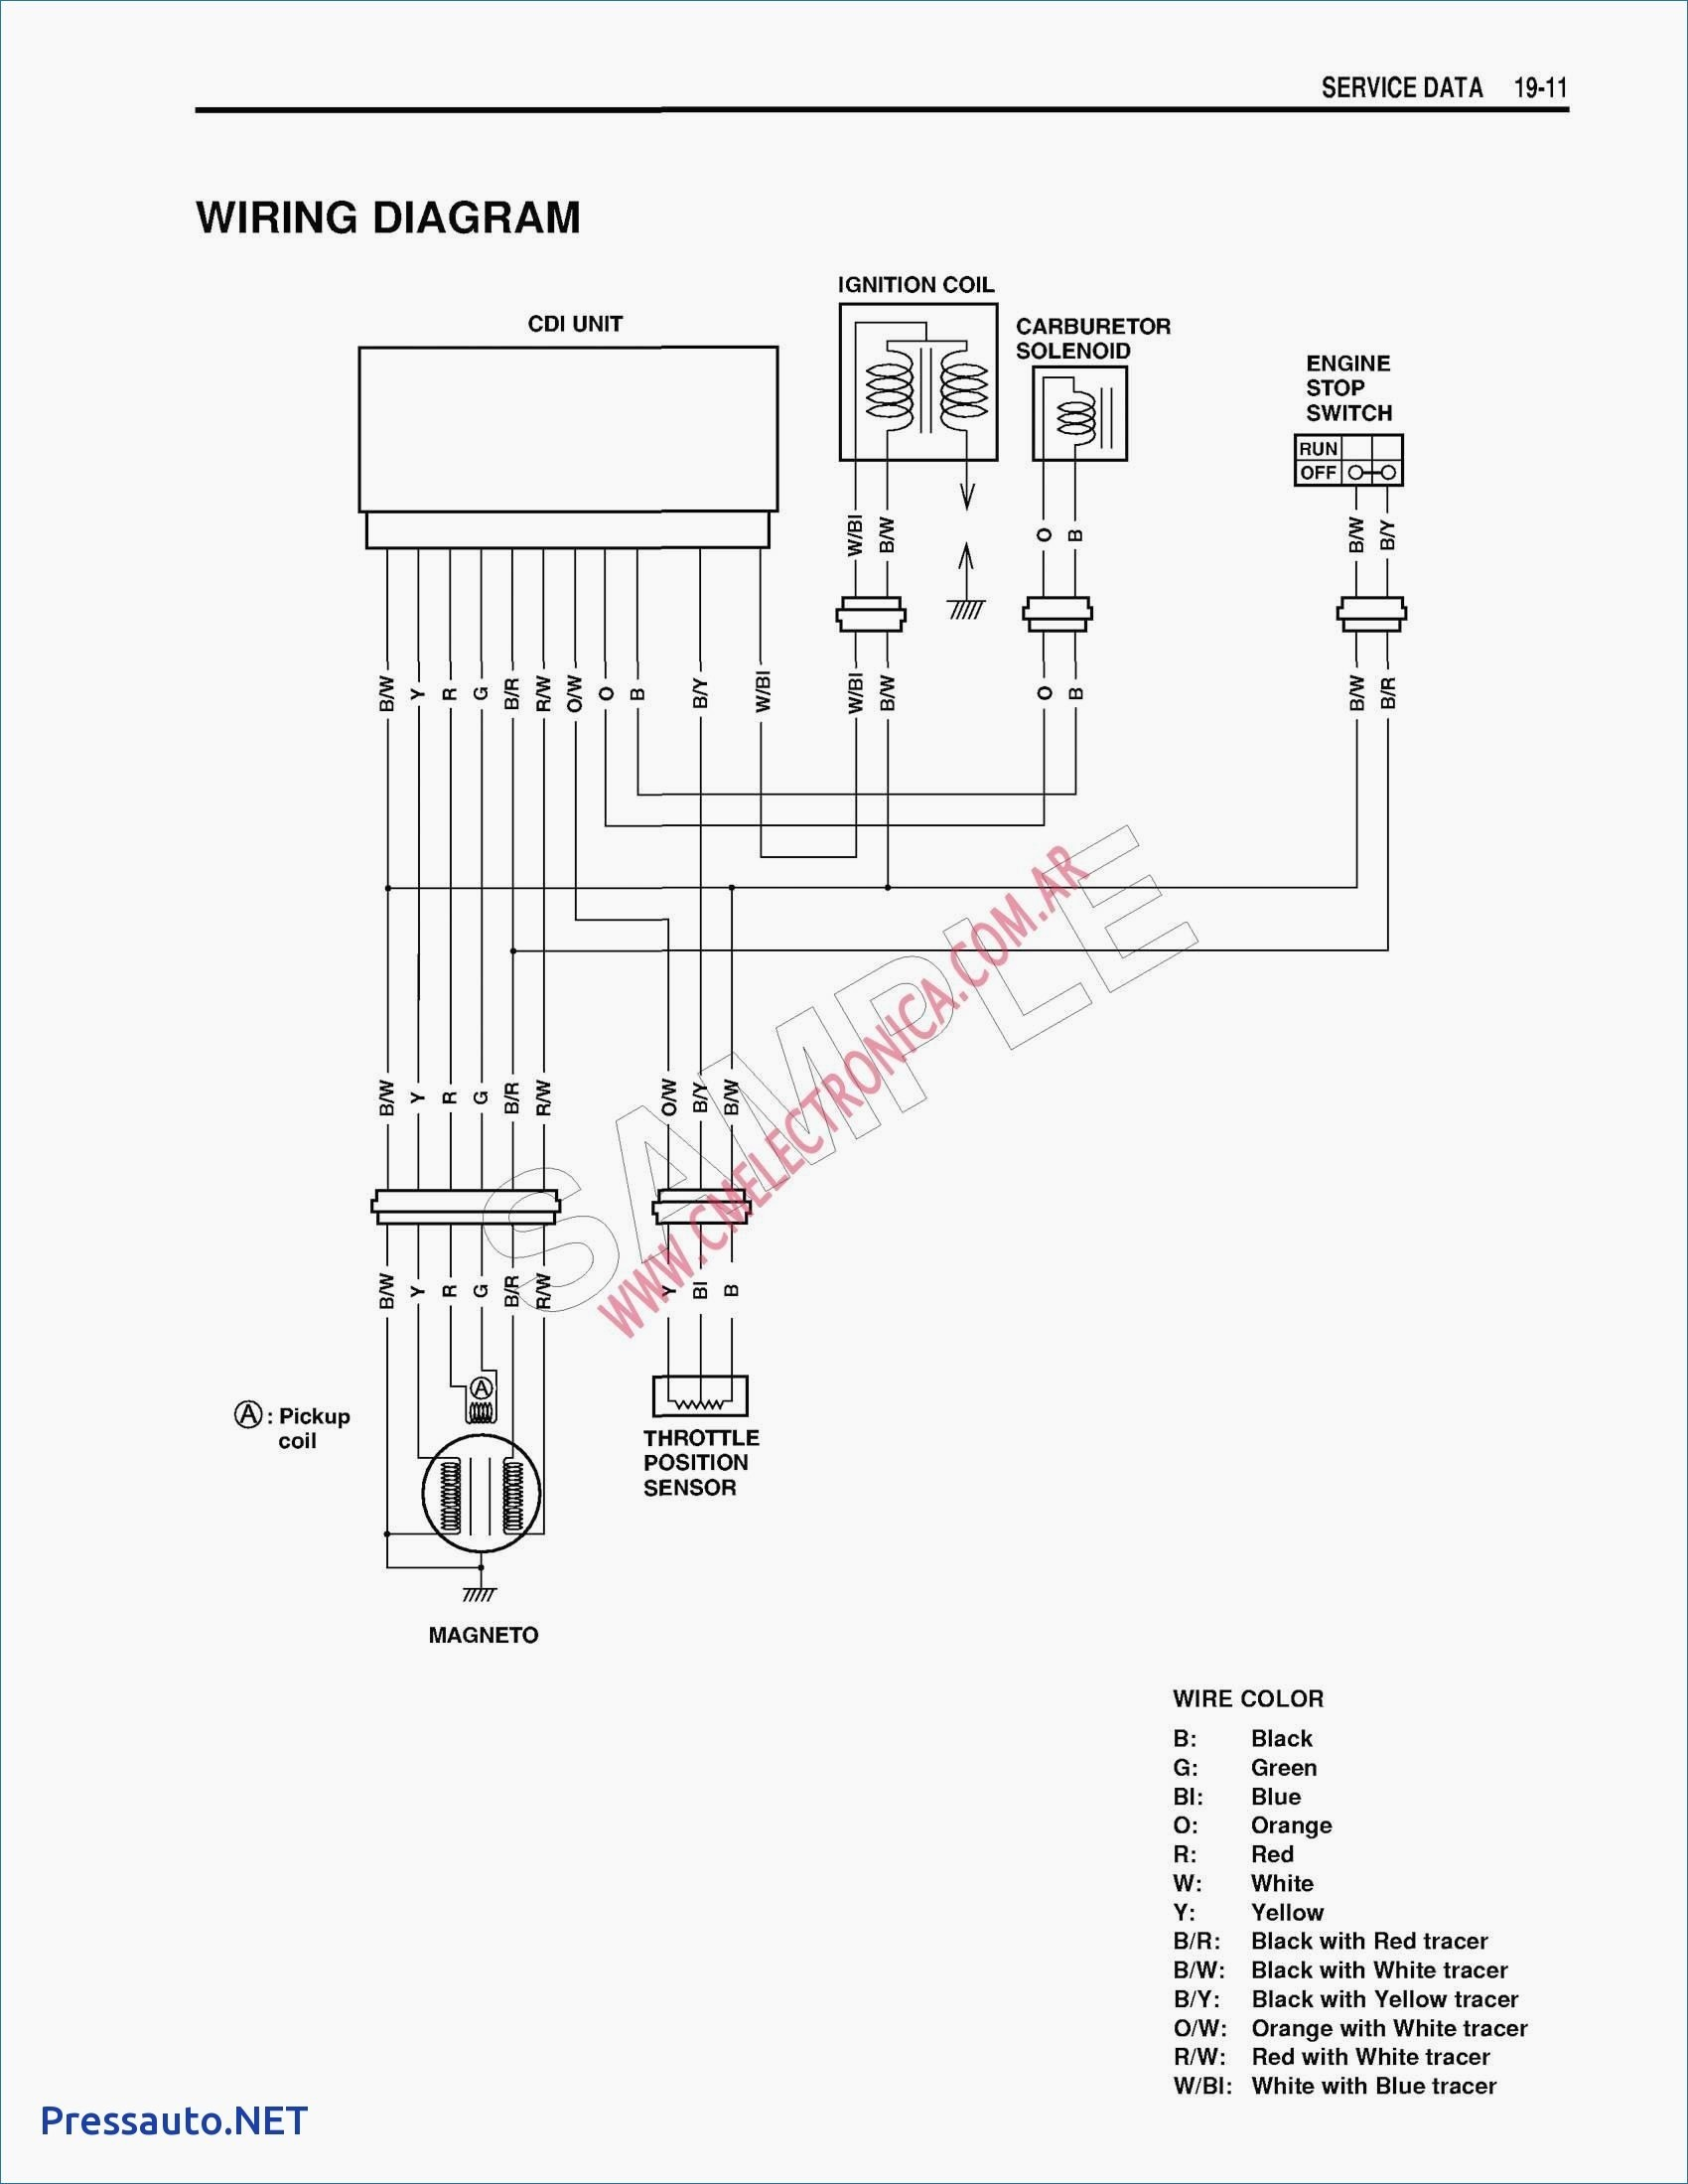 Wiring Diagram Honda C70 Cdi Valid Honda Cdi Wiring Application Wiring Diagram •